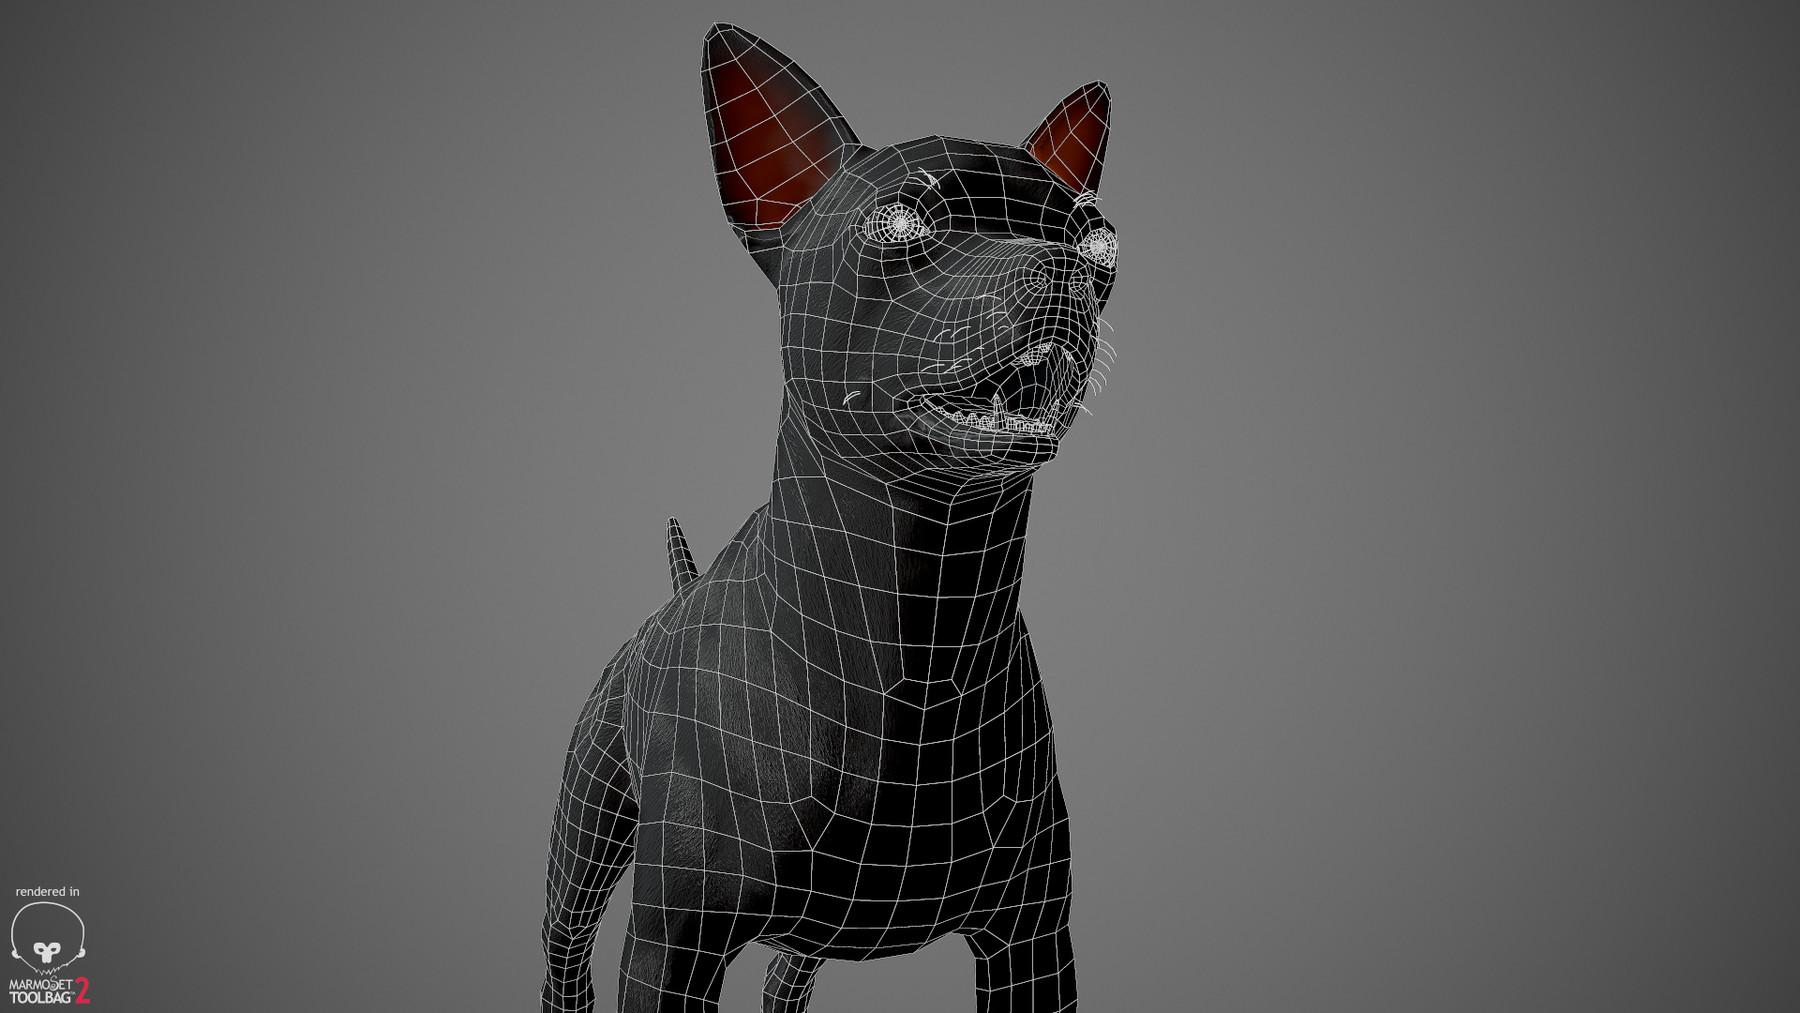 Chihuahua by alexlashko wireframe 04